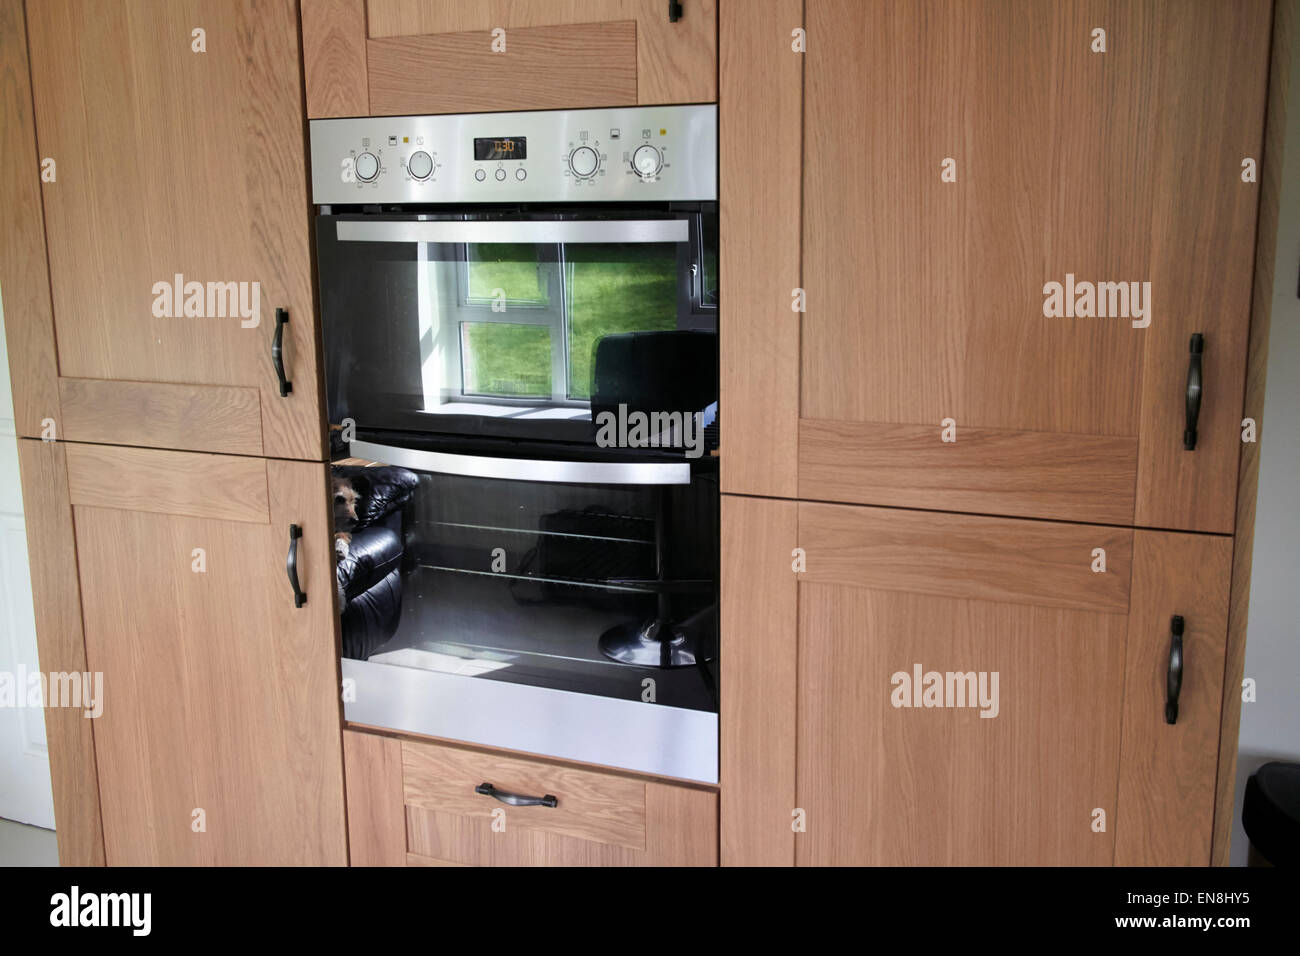 Double oven stockfotos & double oven bilder alamy